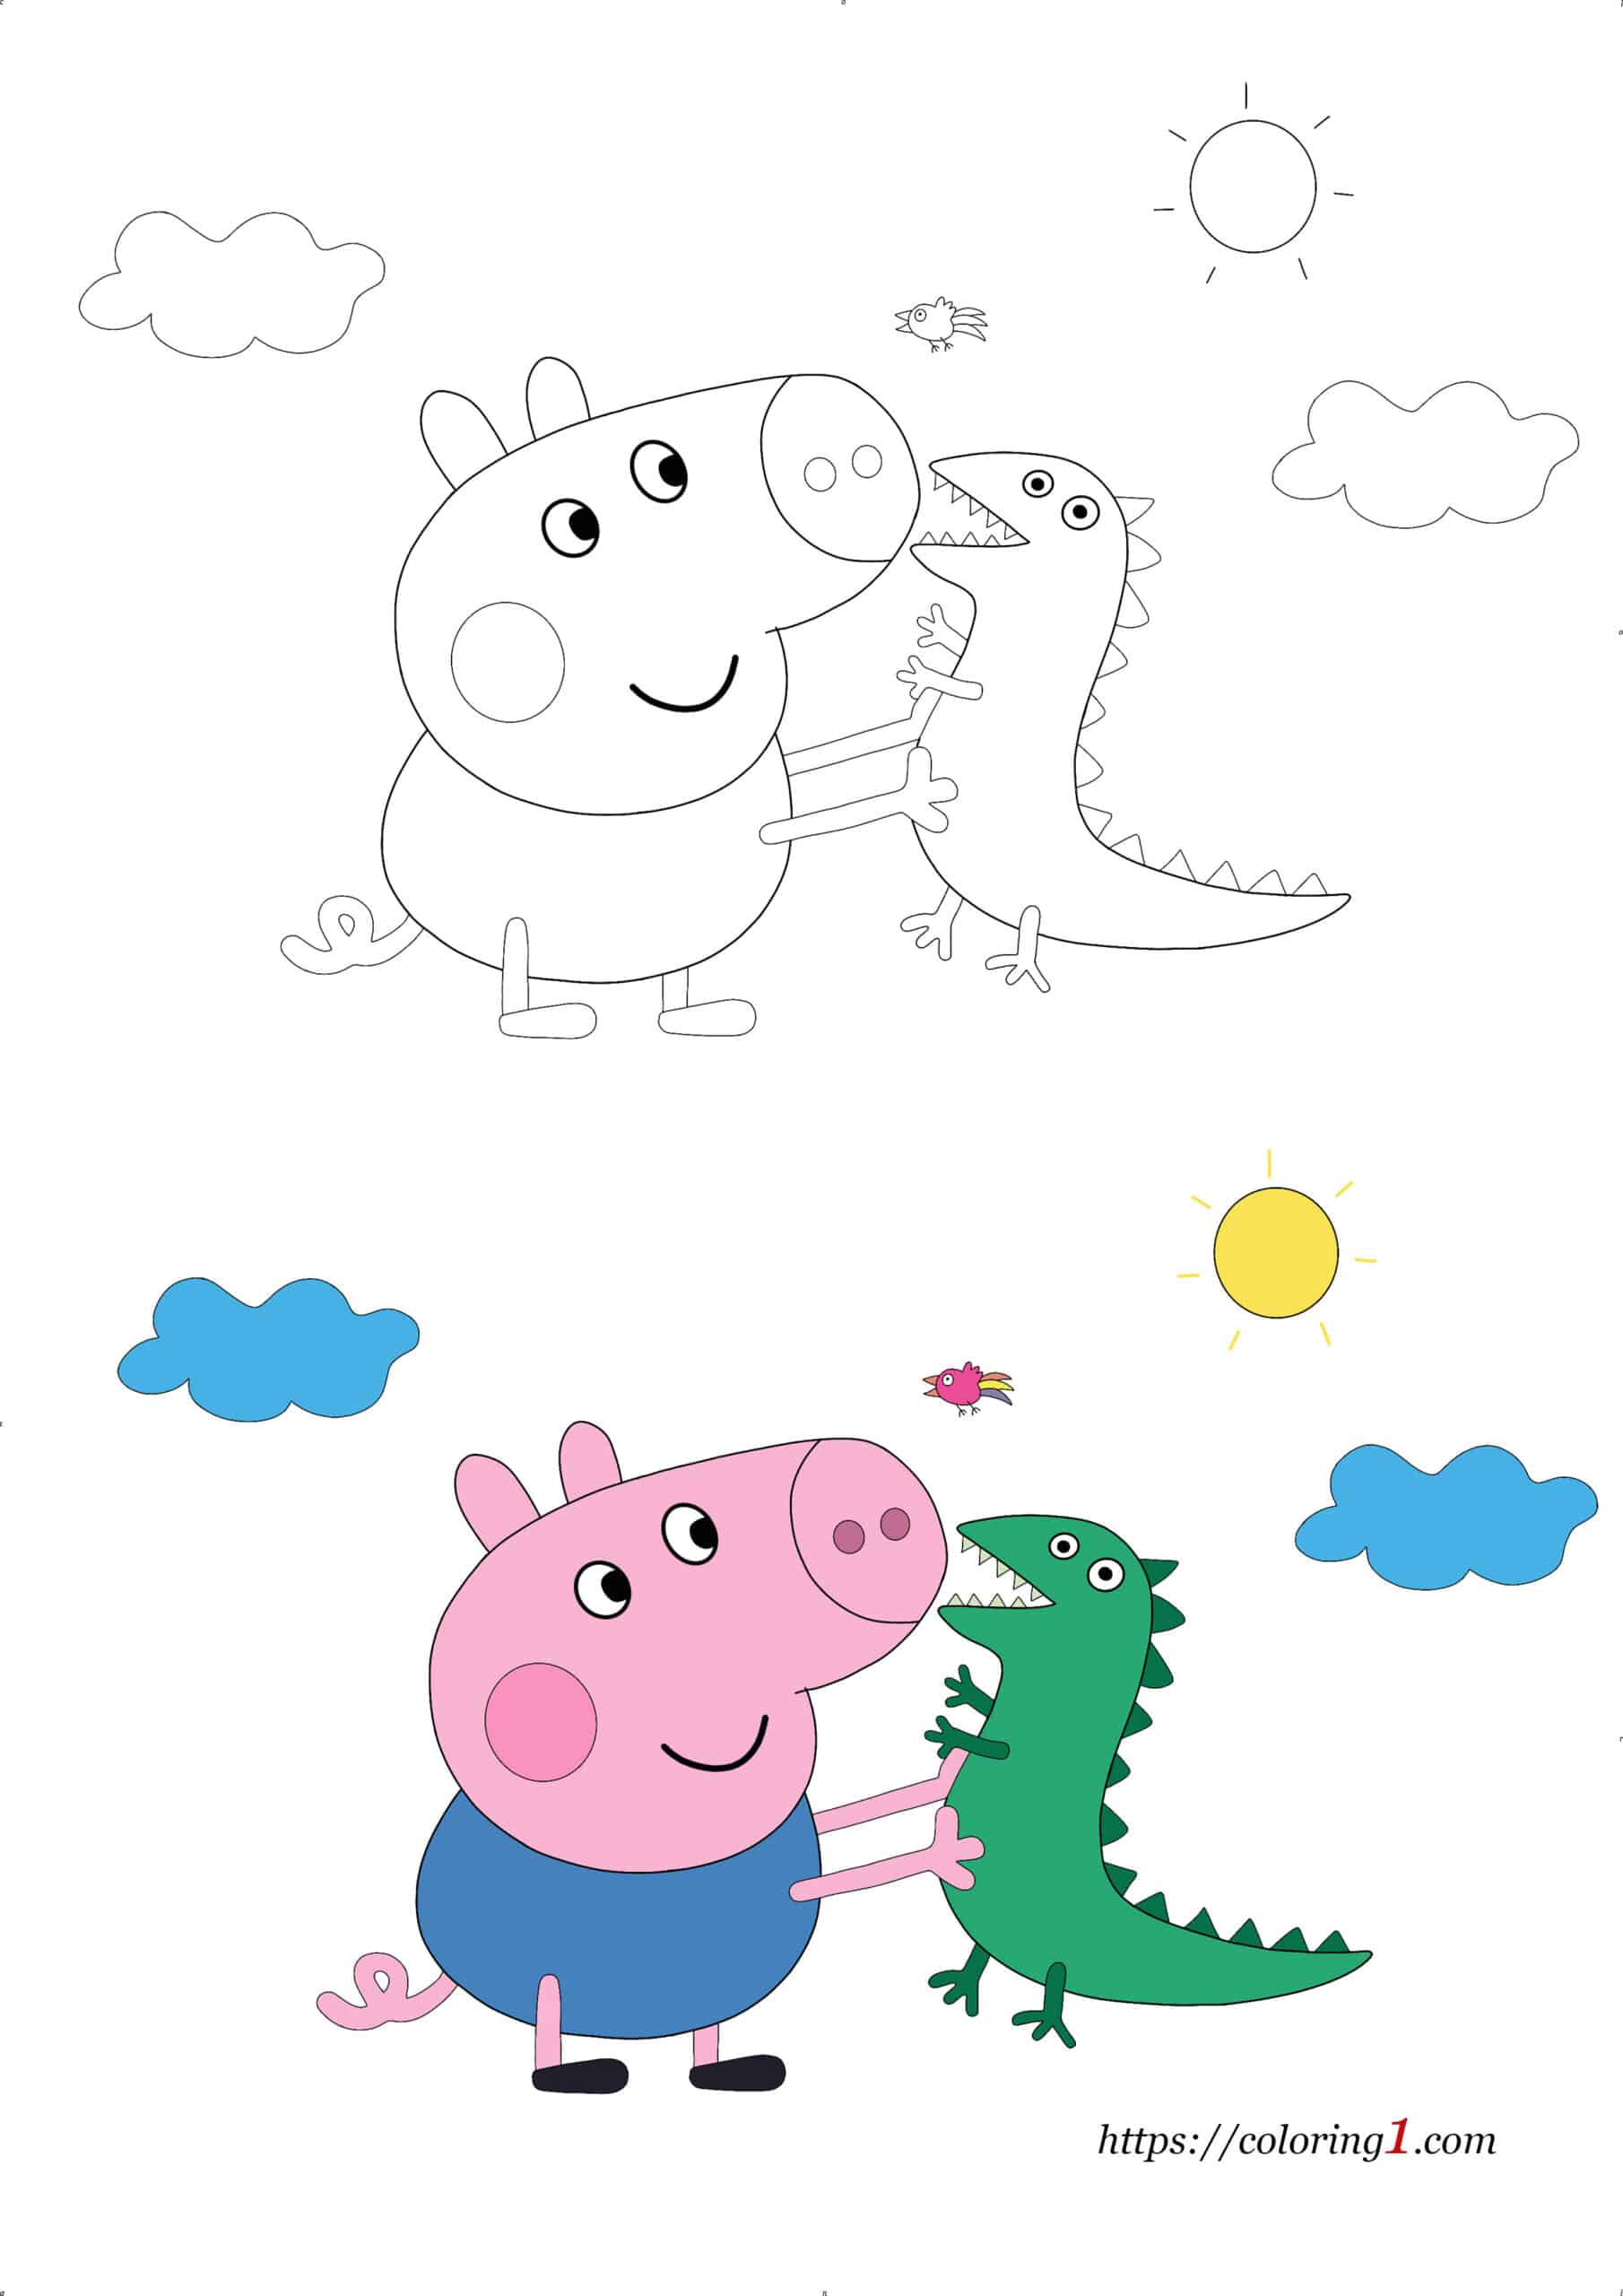 Coloriage Dessin Peppa Pig George avec Dinosaure